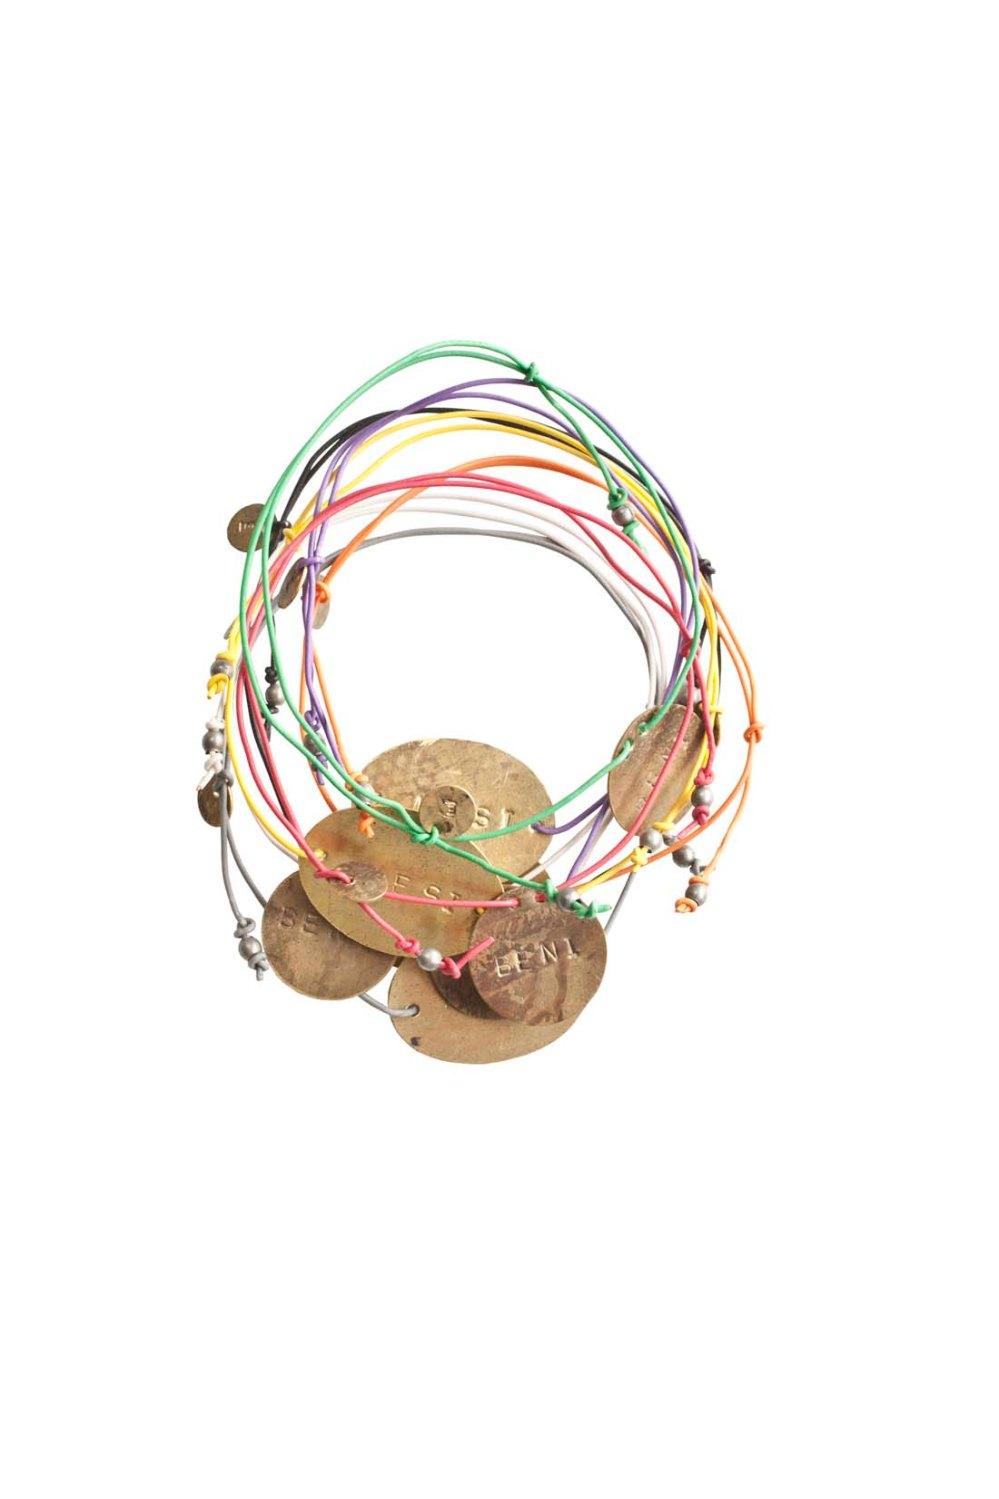 medium resolution of ethical fashion initiative fashion partners osklen electrical wiring in haiti